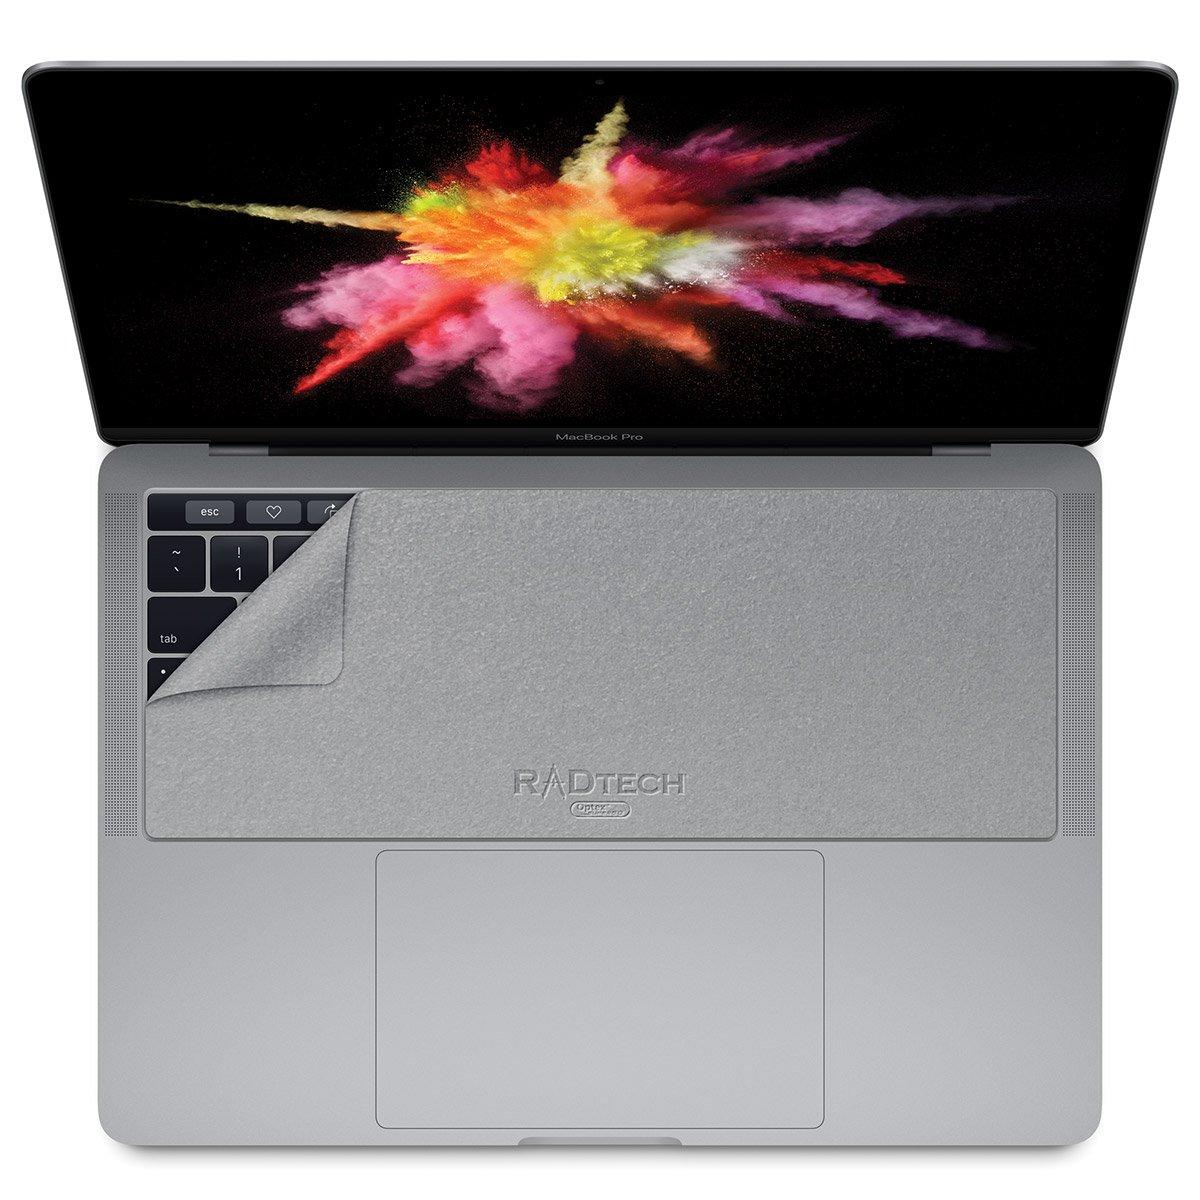 RadTech Notebook Gear: ScreenSavrz, Apple MacBook Pro 13''/15'' (2016/17) - Gray (16401)